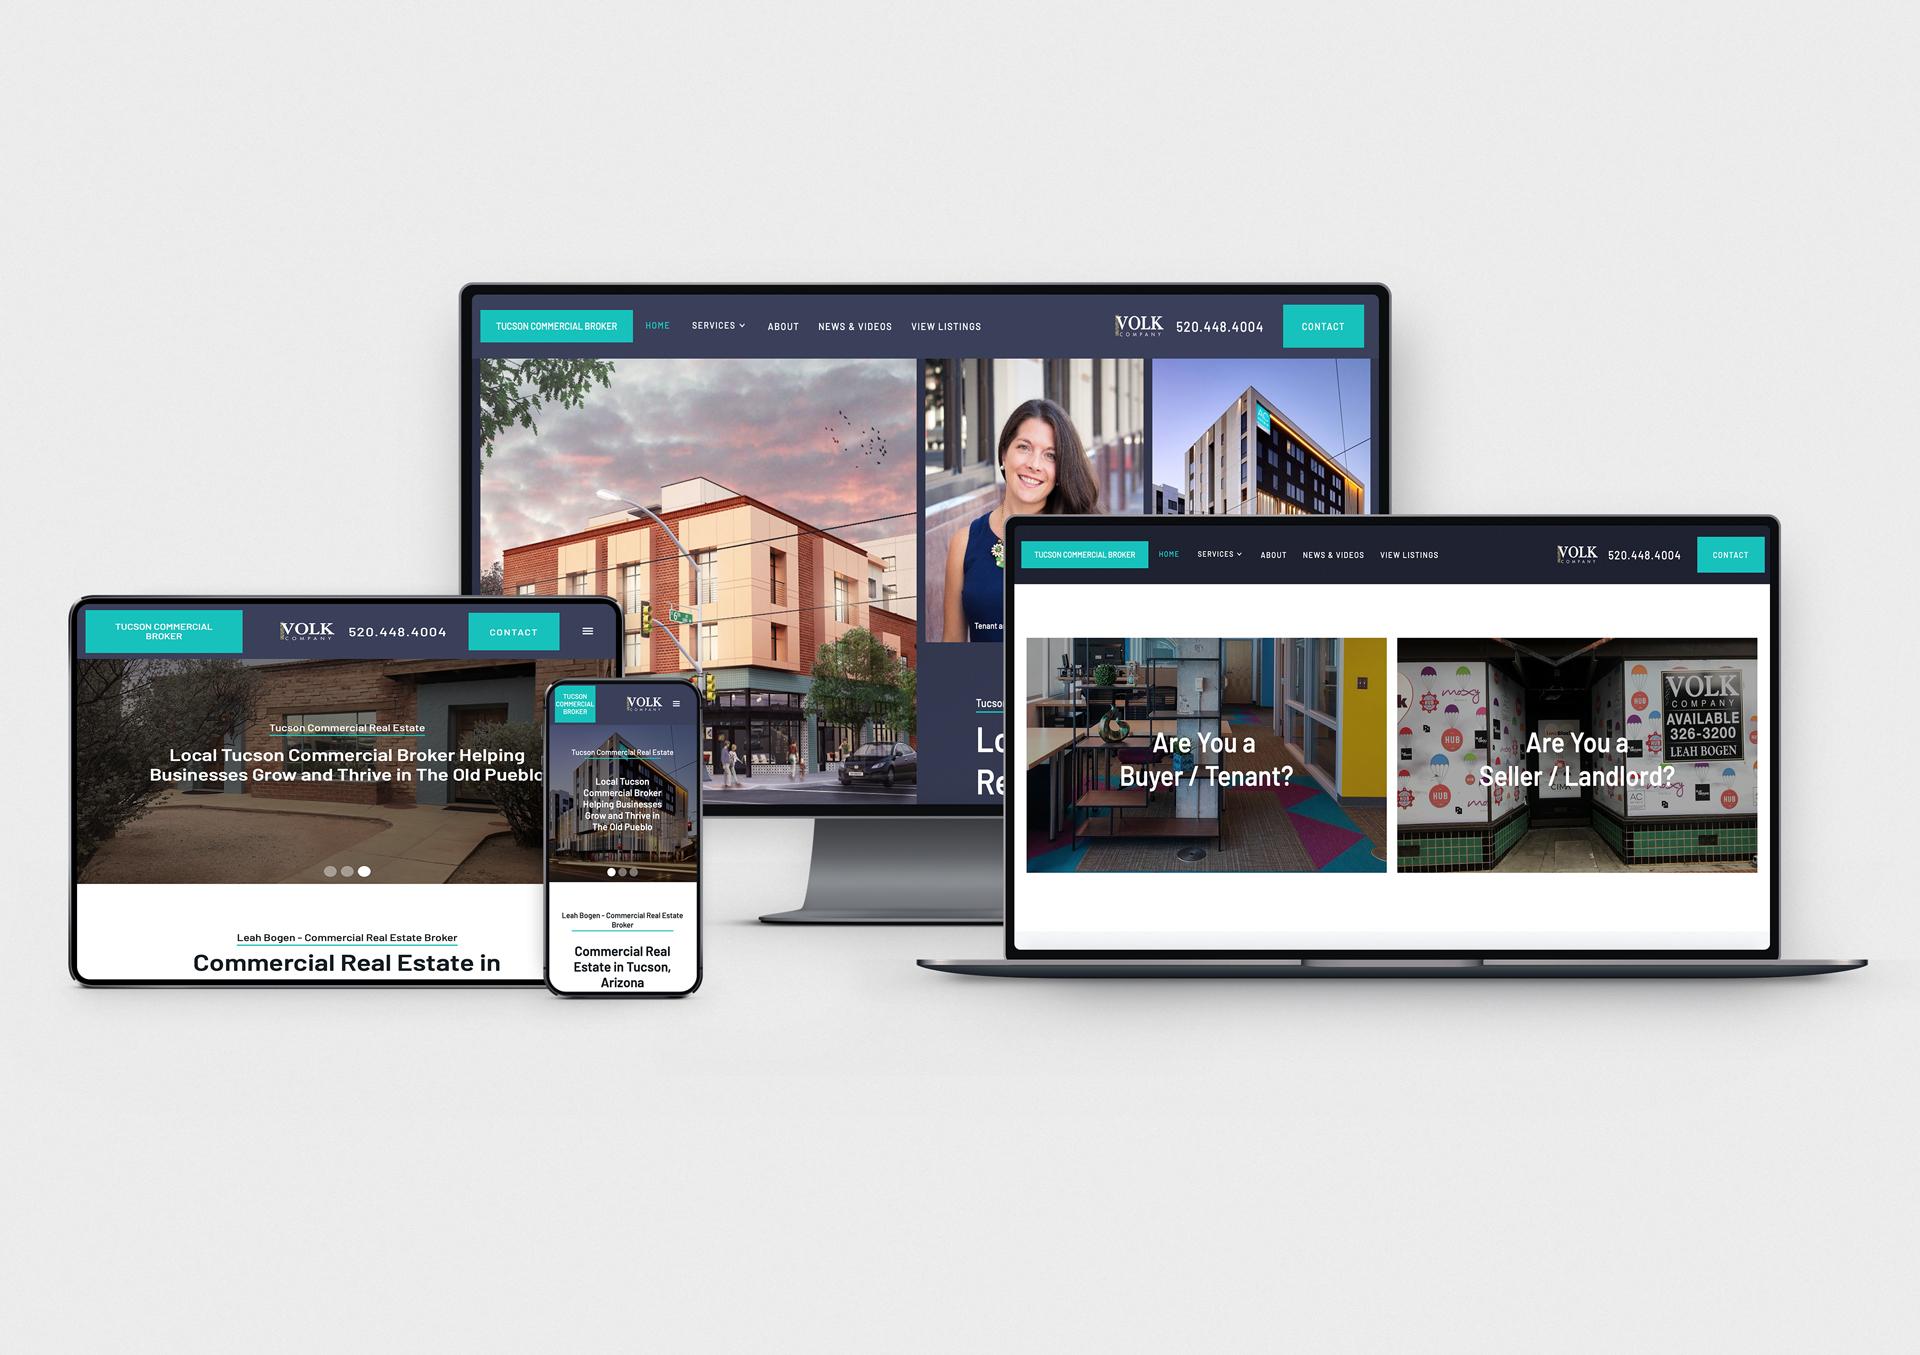 Tucson Web Design and development experts